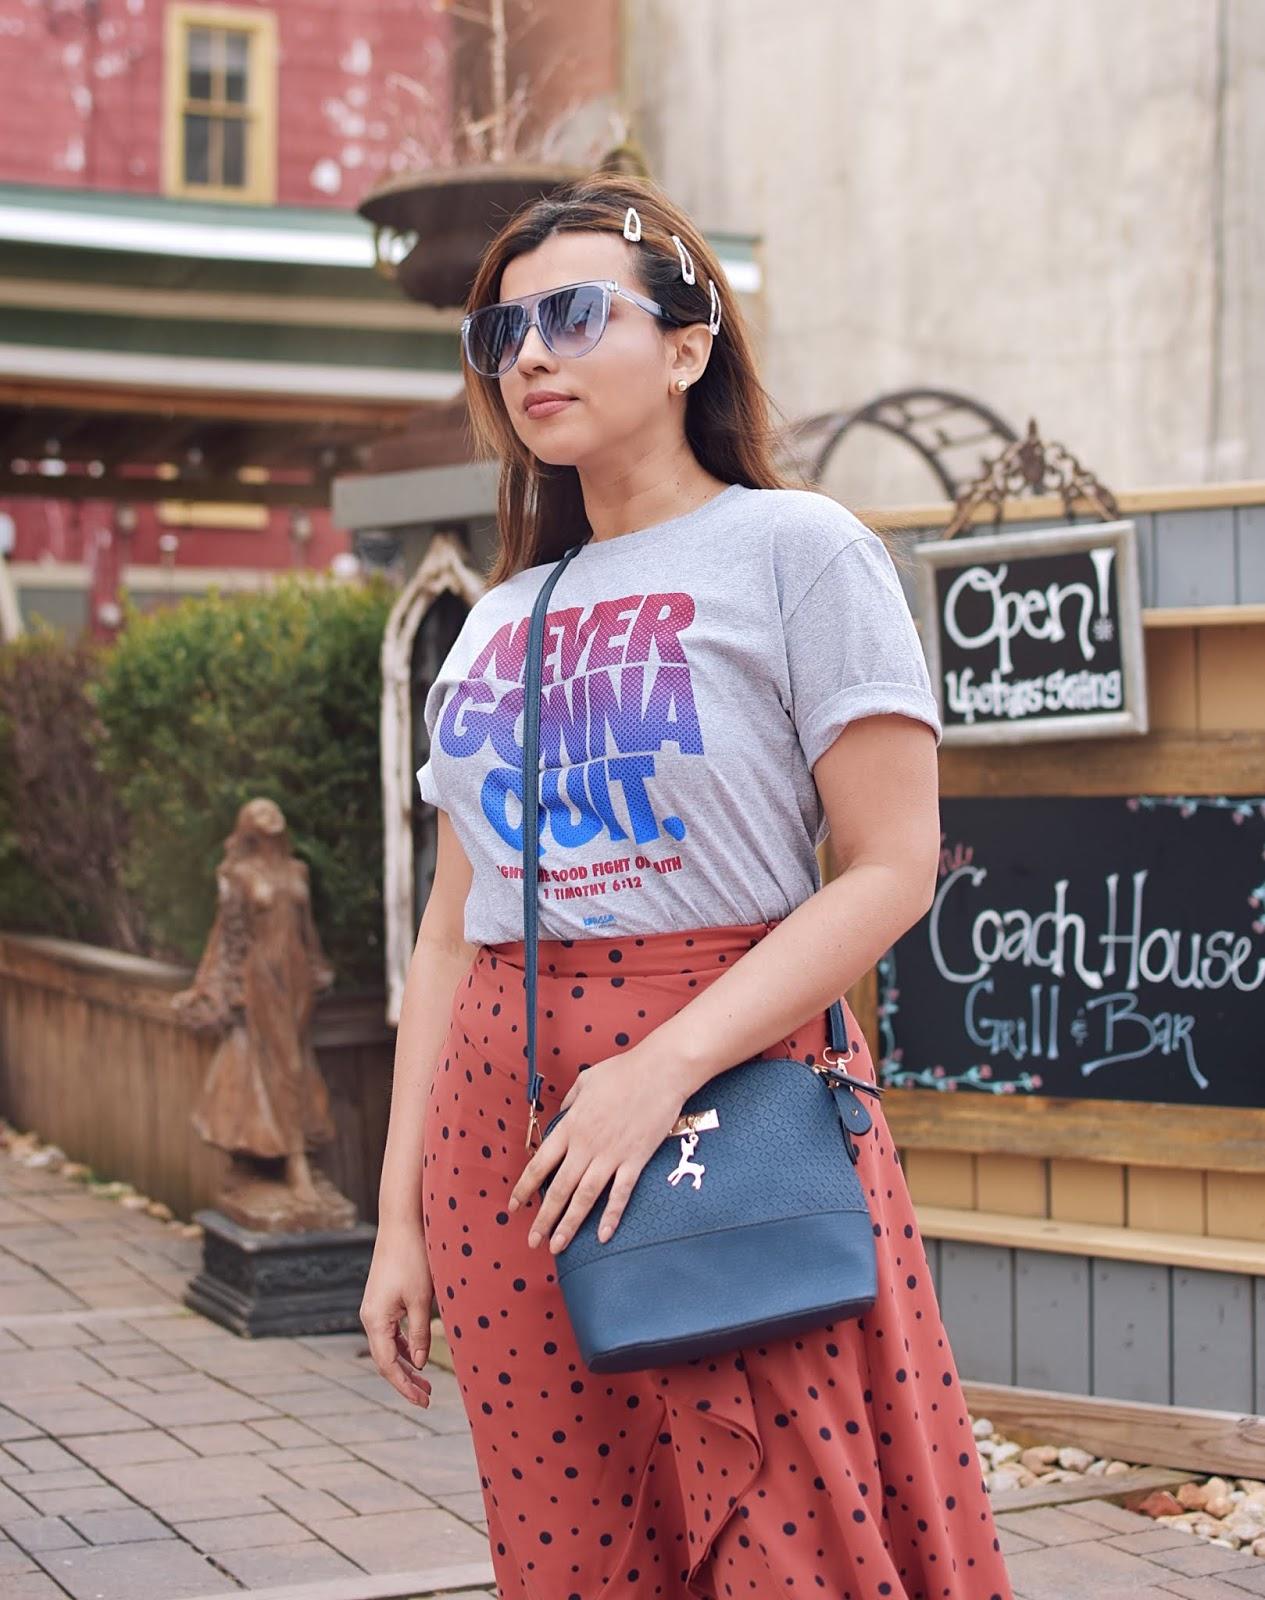 Asymmetrical Hem Polka Dot Print Skirt-MariEstilo-shein-fashionblogger-tendencias 2019-dcblogger-fashionista-streetstyle-travelblogger-westvirginia-harpers ferry-lookbook-